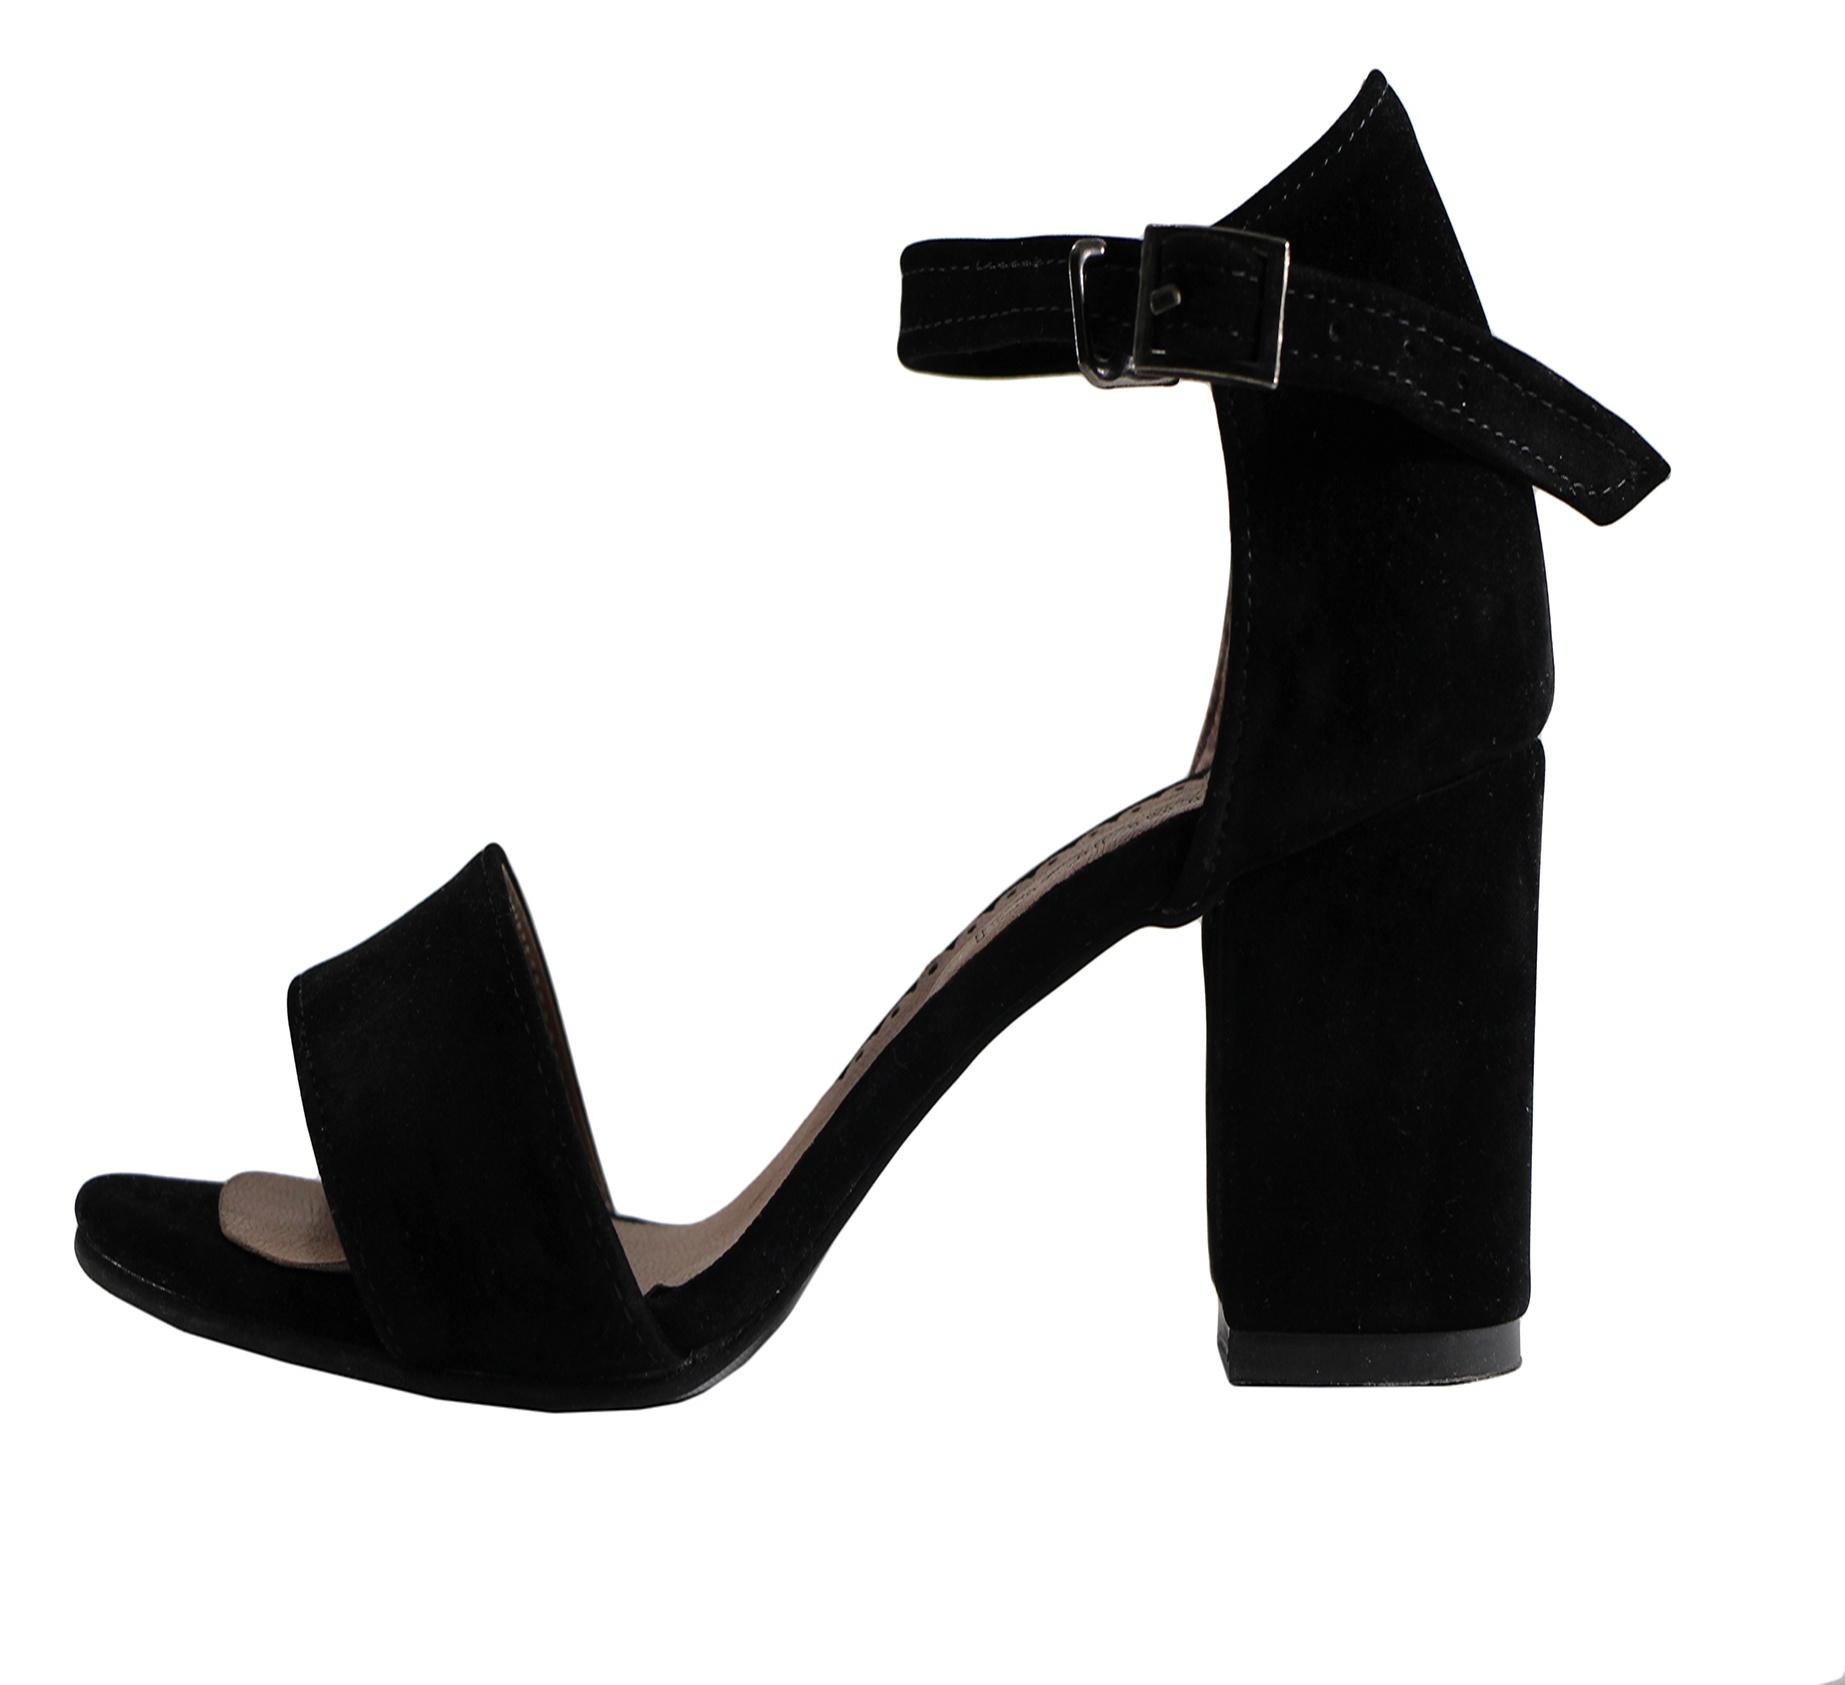 کفش زنانه عالیجناب کد kl211310b